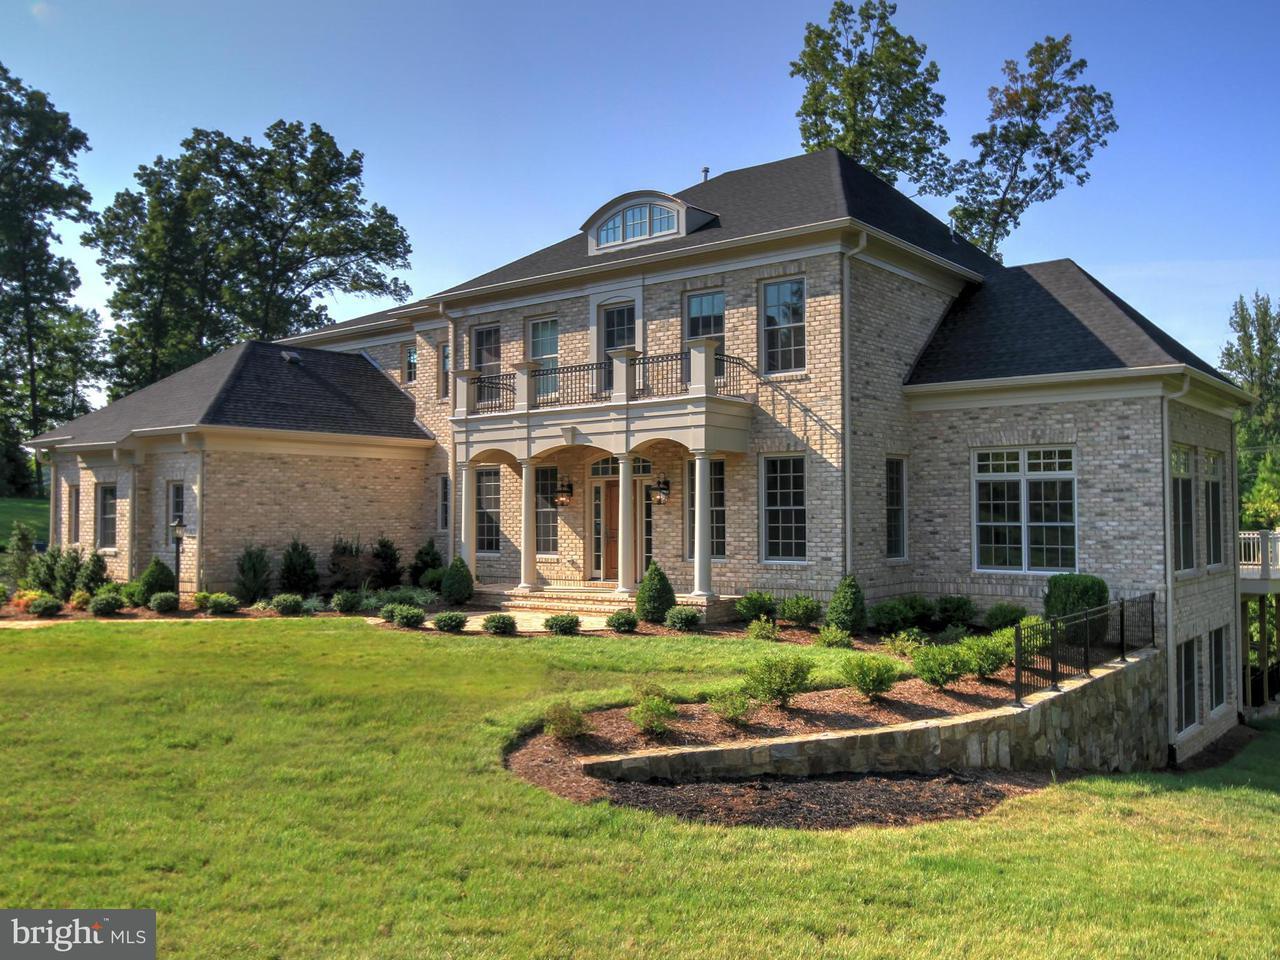 Single Family Home for Sale at 1063 AUTUMN MIST Lane 1063 AUTUMN MIST Lane Great Falls, Virginia 22066 United States